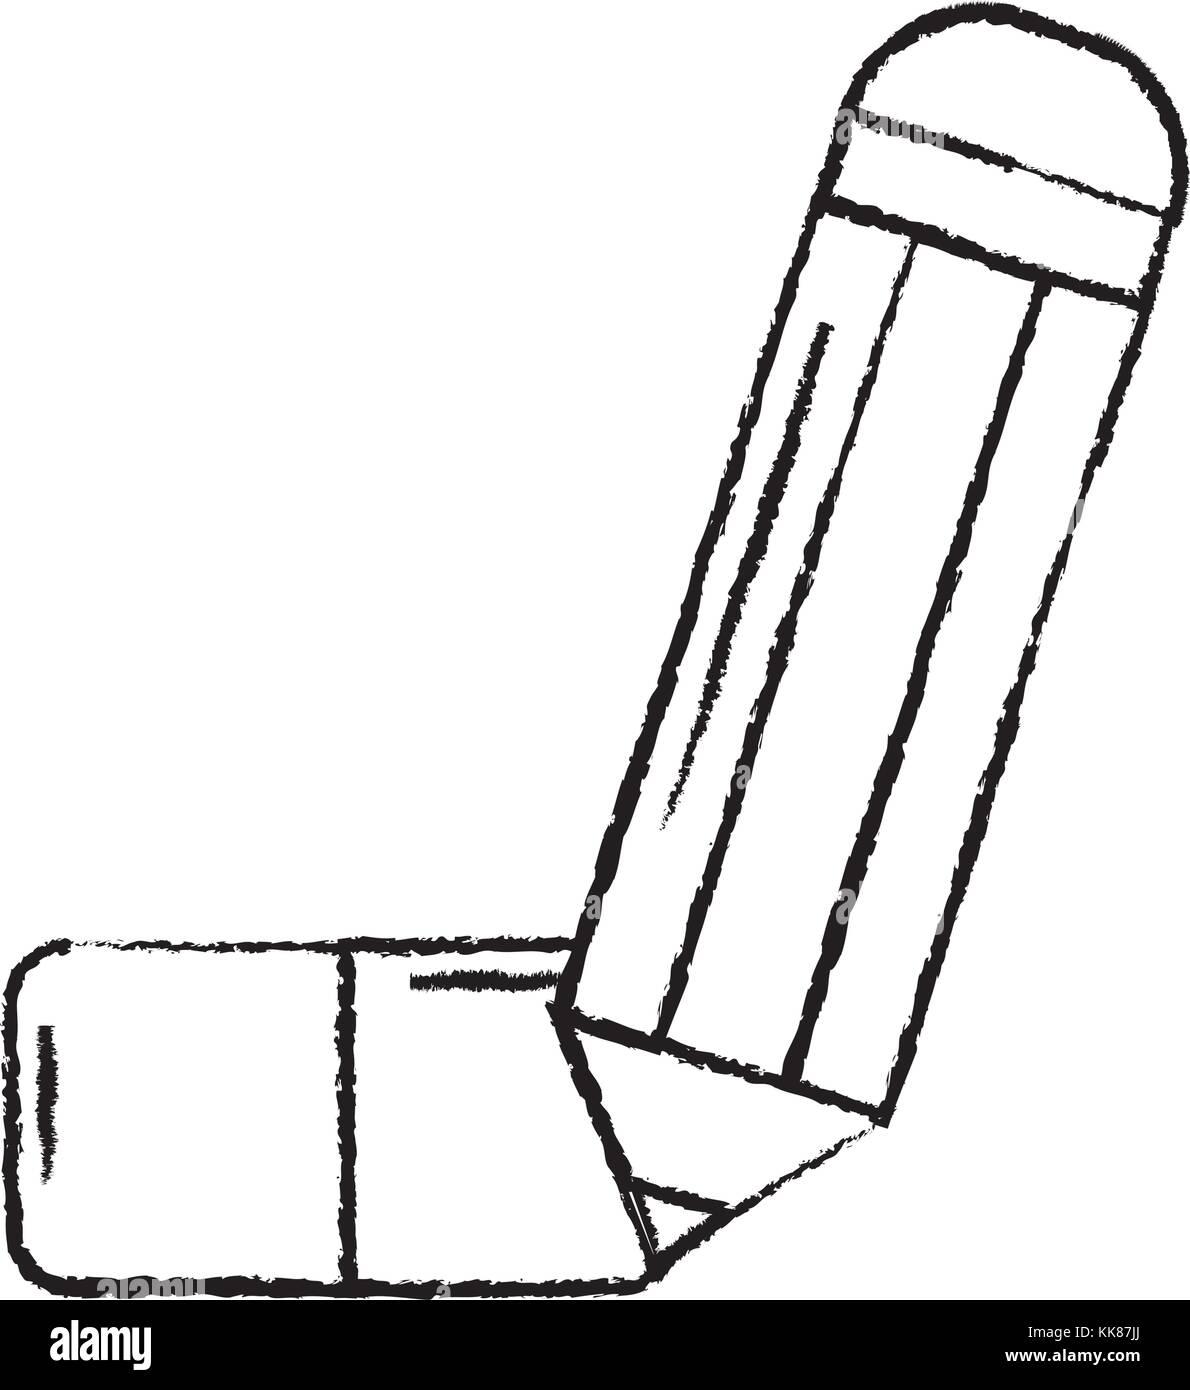 pencil with eraser school supplies icon image  - Stock Vector